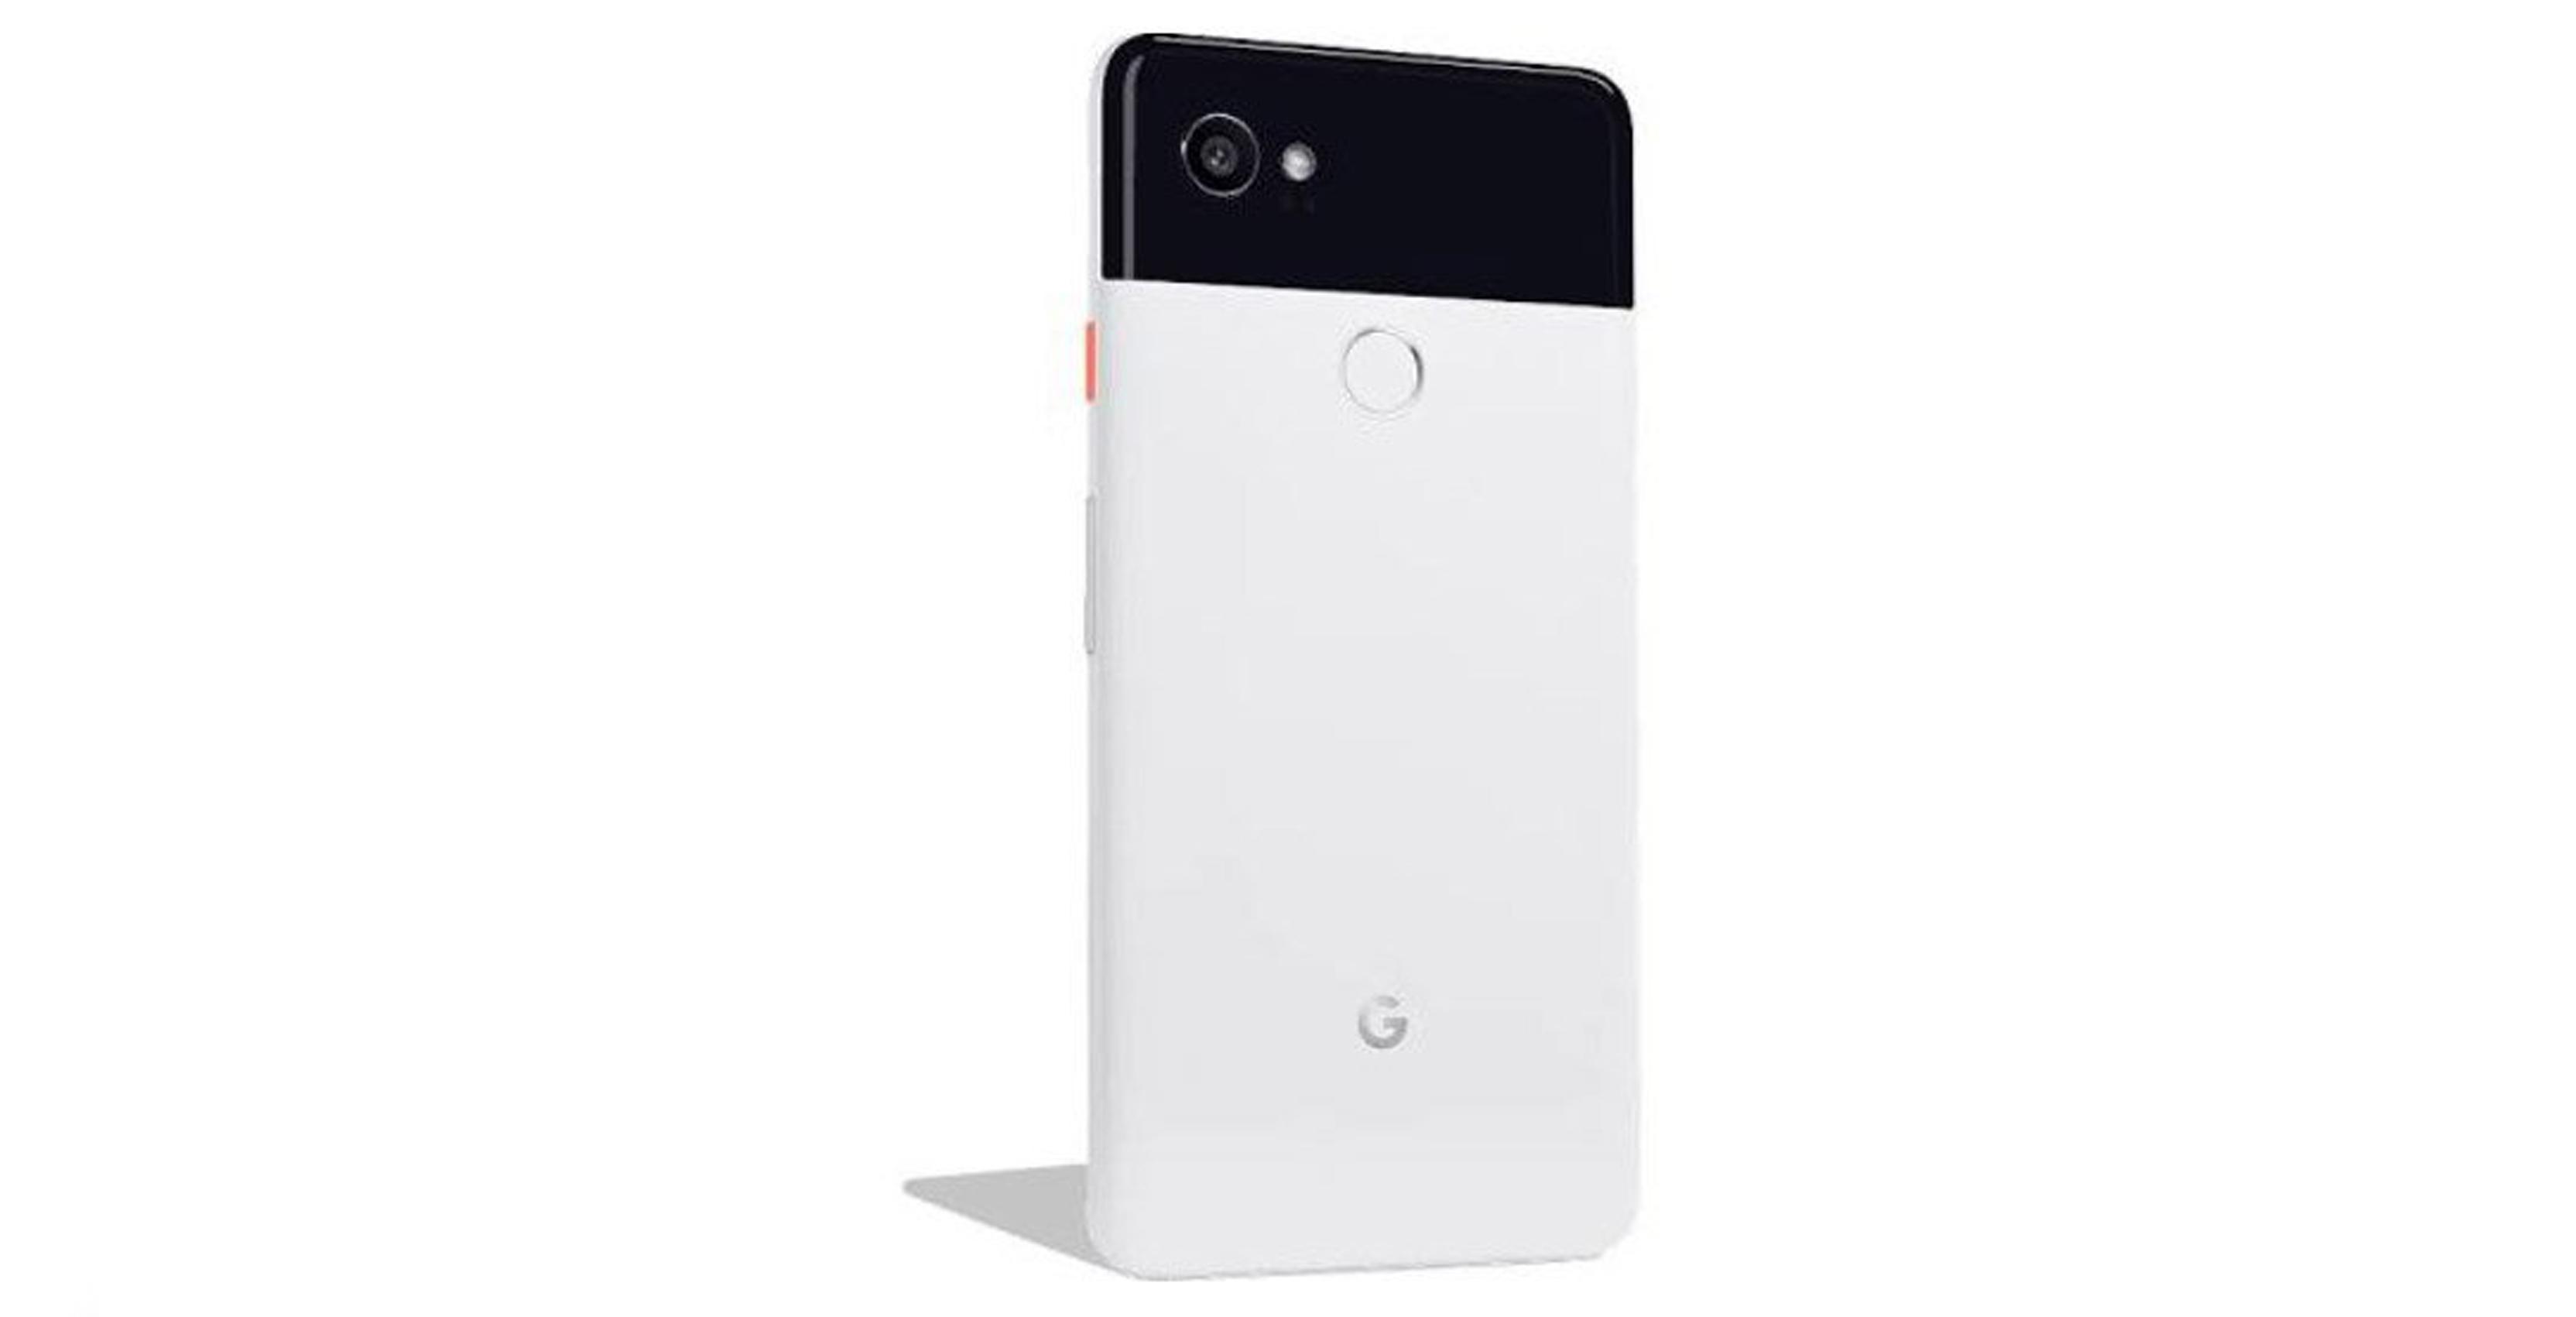 Leaked render of Pixel 2 XL smartphone